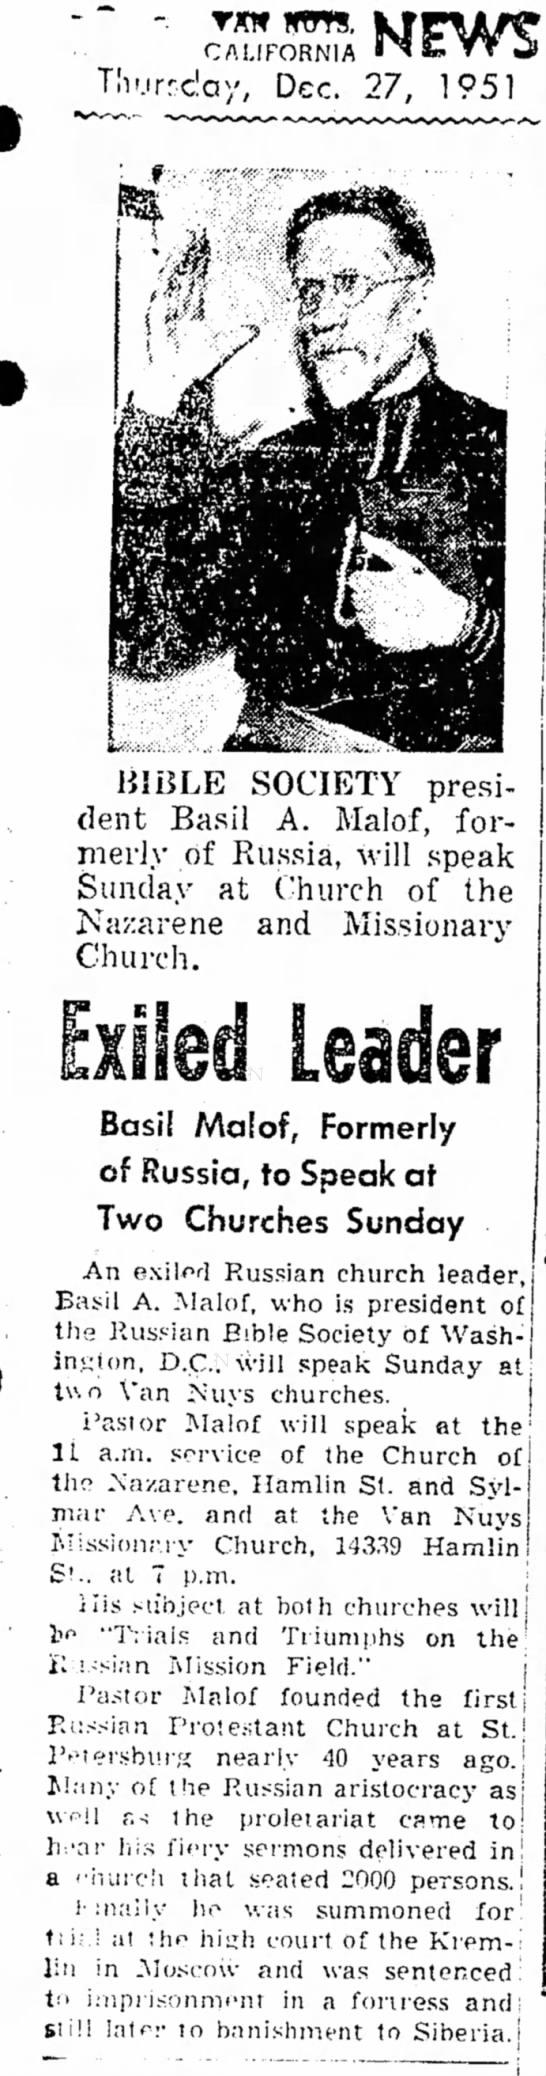 Basil Malof Dec 27 1951 - C A L I F O R N I A Tlv.irrclay, Dec. 27, 1951...